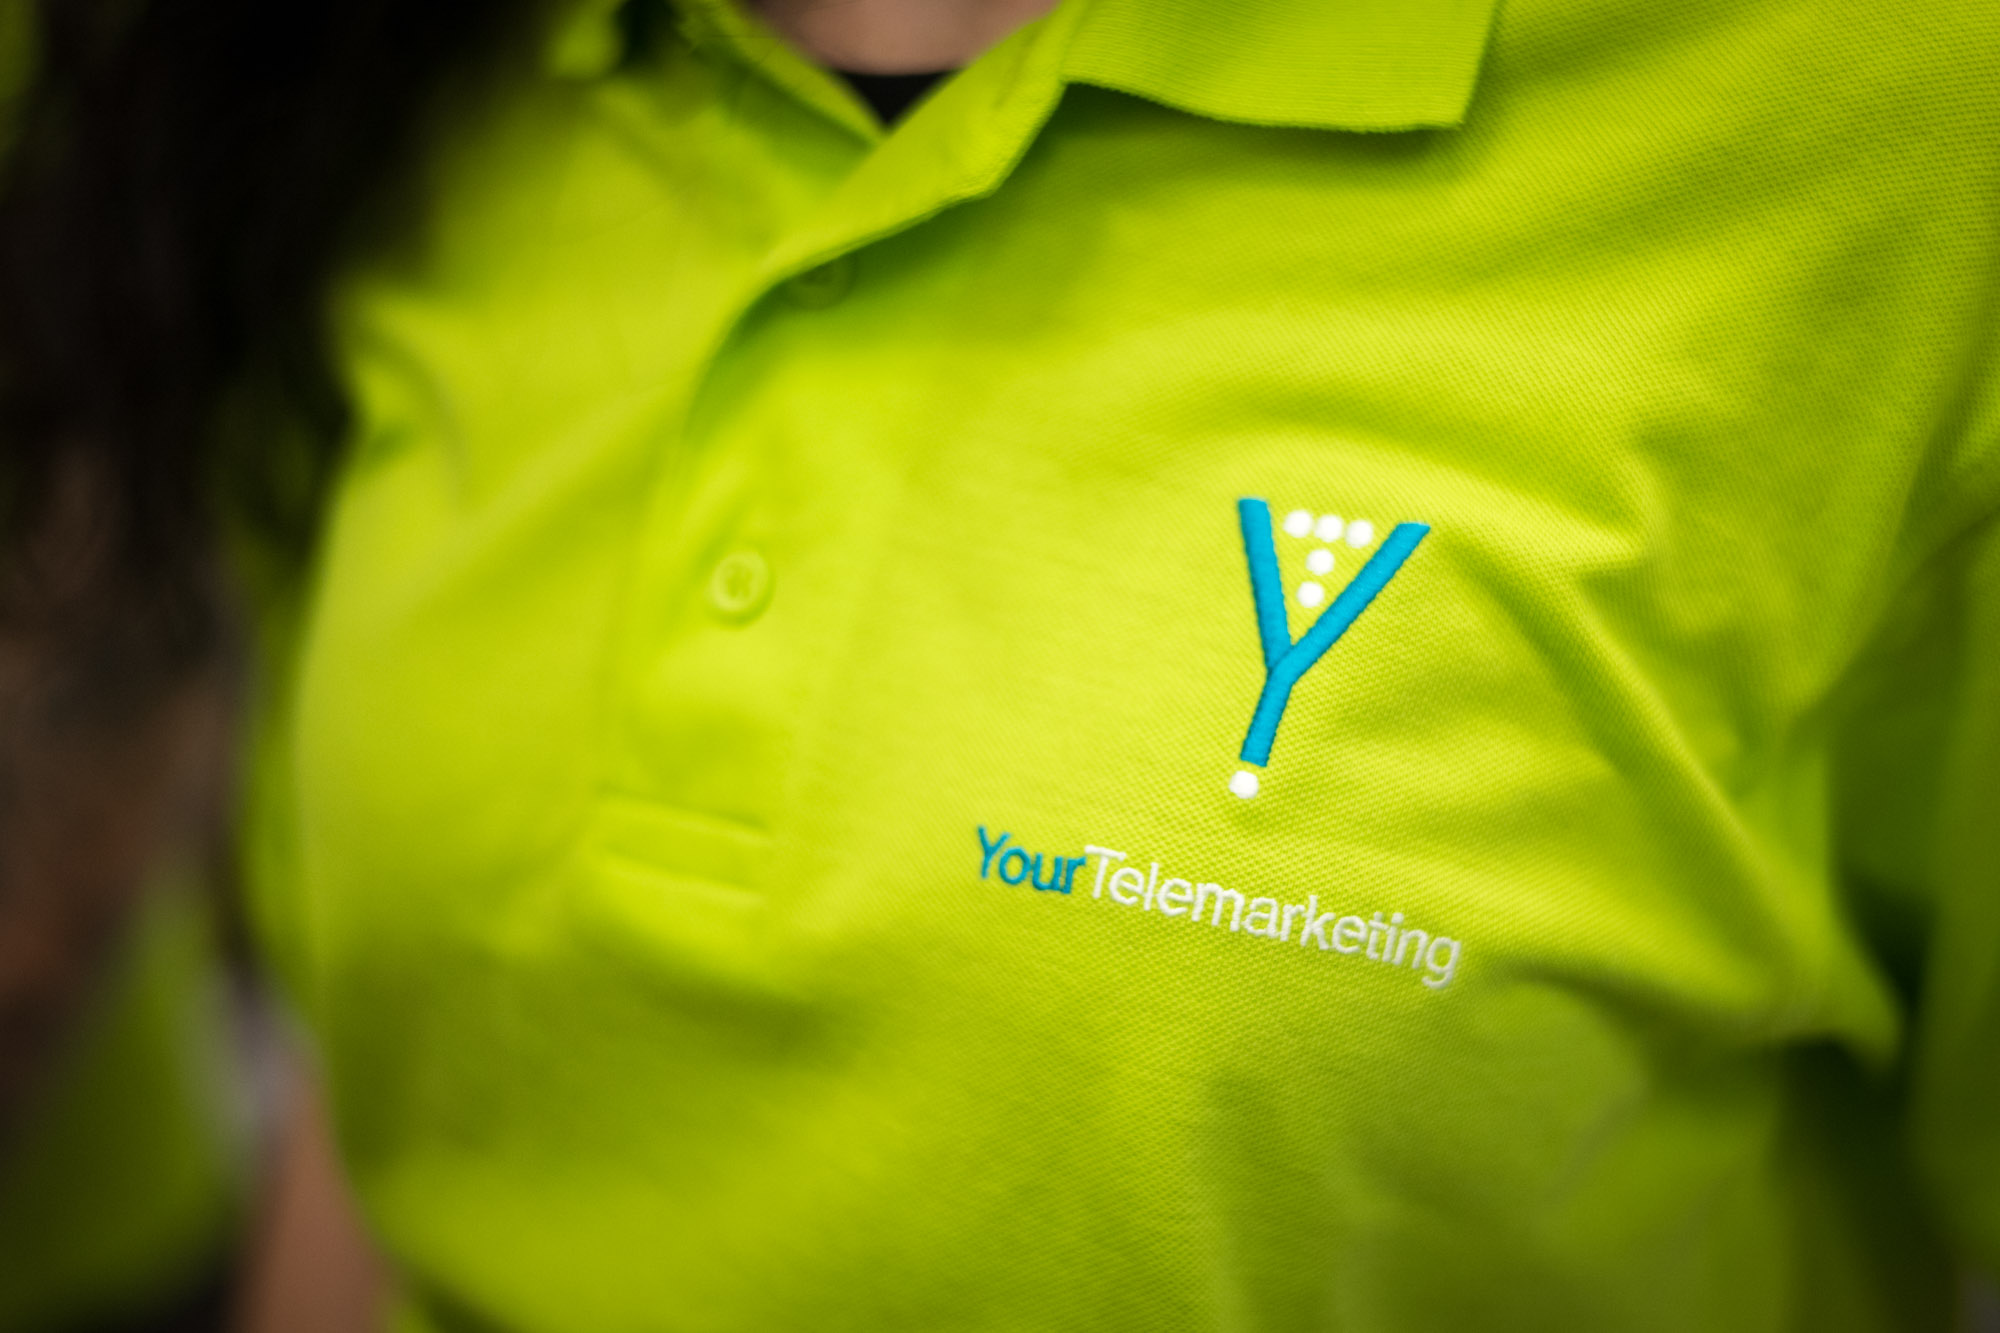 Your Telemarketing Logo On A Green Polo Shirt